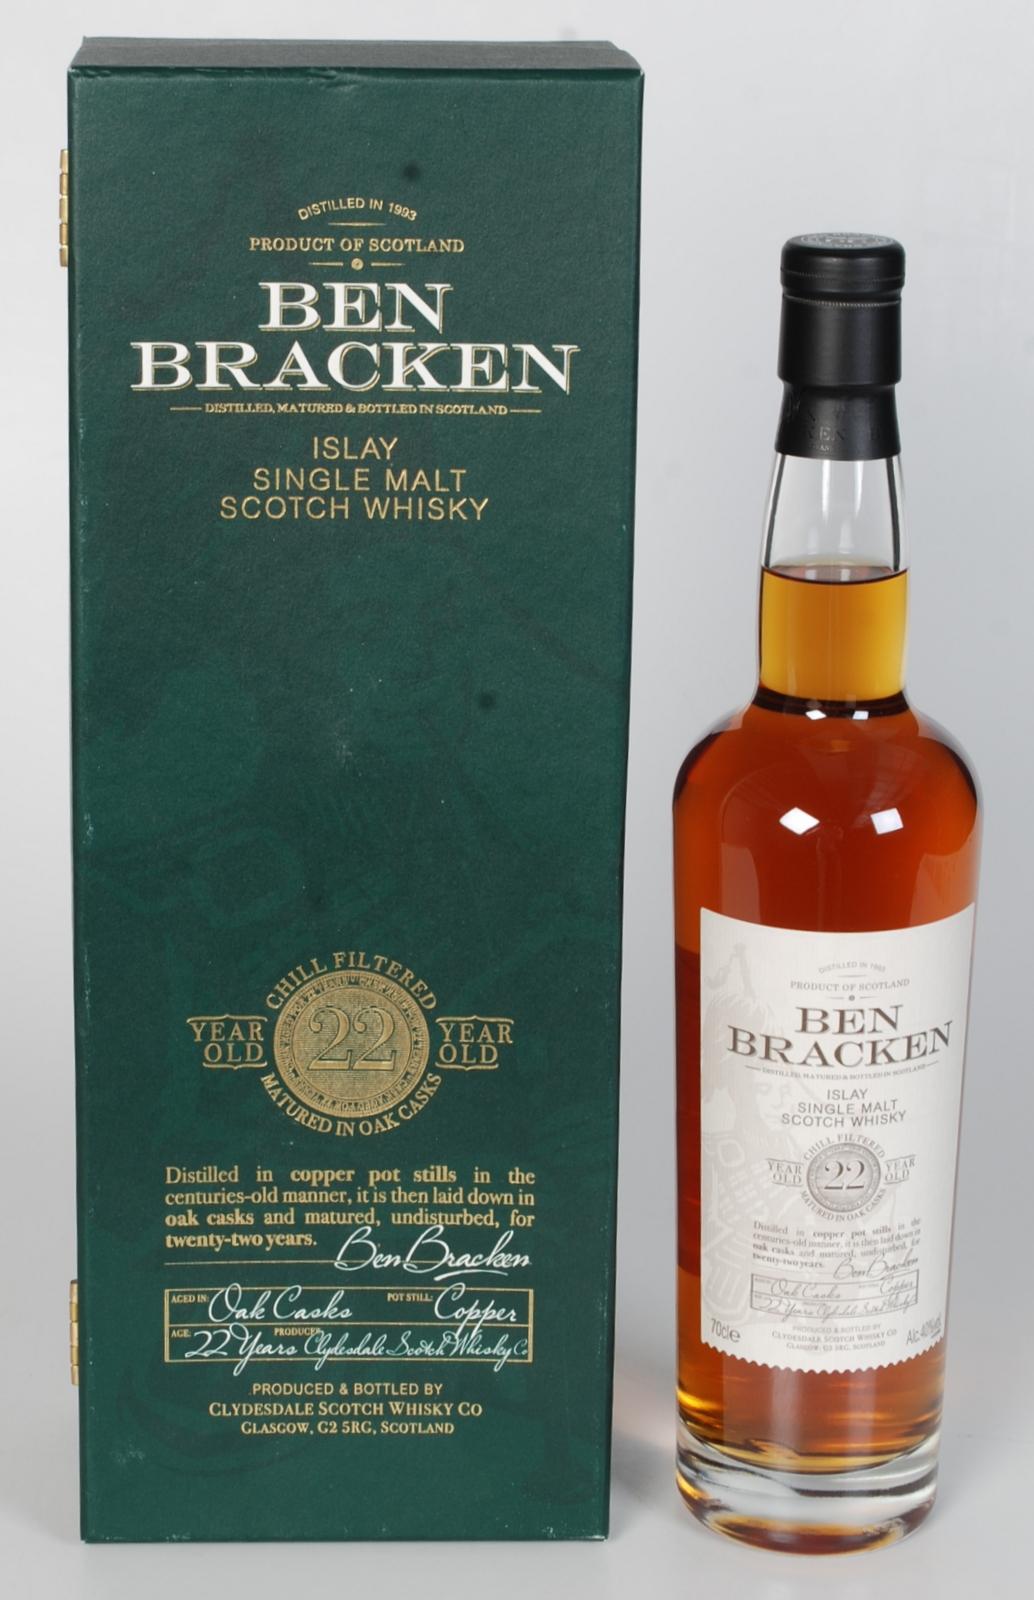 Lot 54 - A Ben Bracken Islay 22 year old single malt Scotch whisky, 70cl, 40% vol.